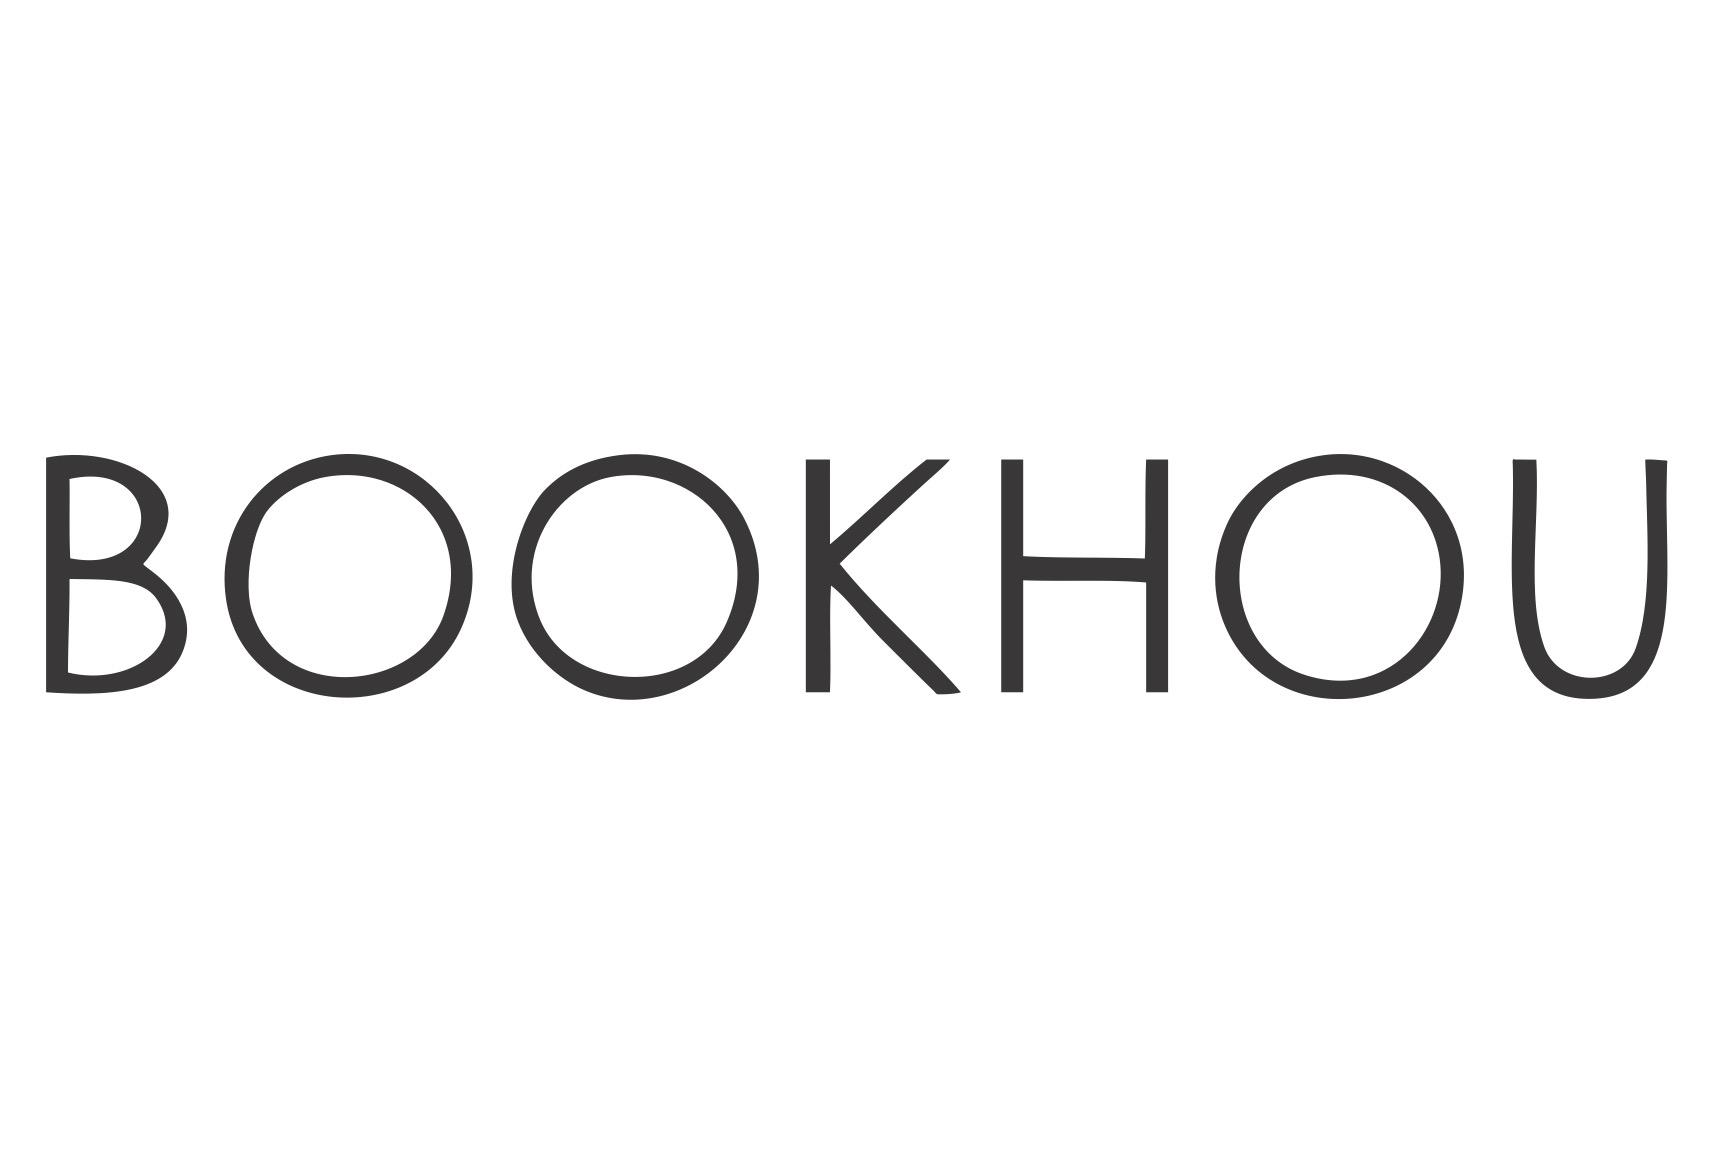 bookhou logo2  - arounna k.jpg